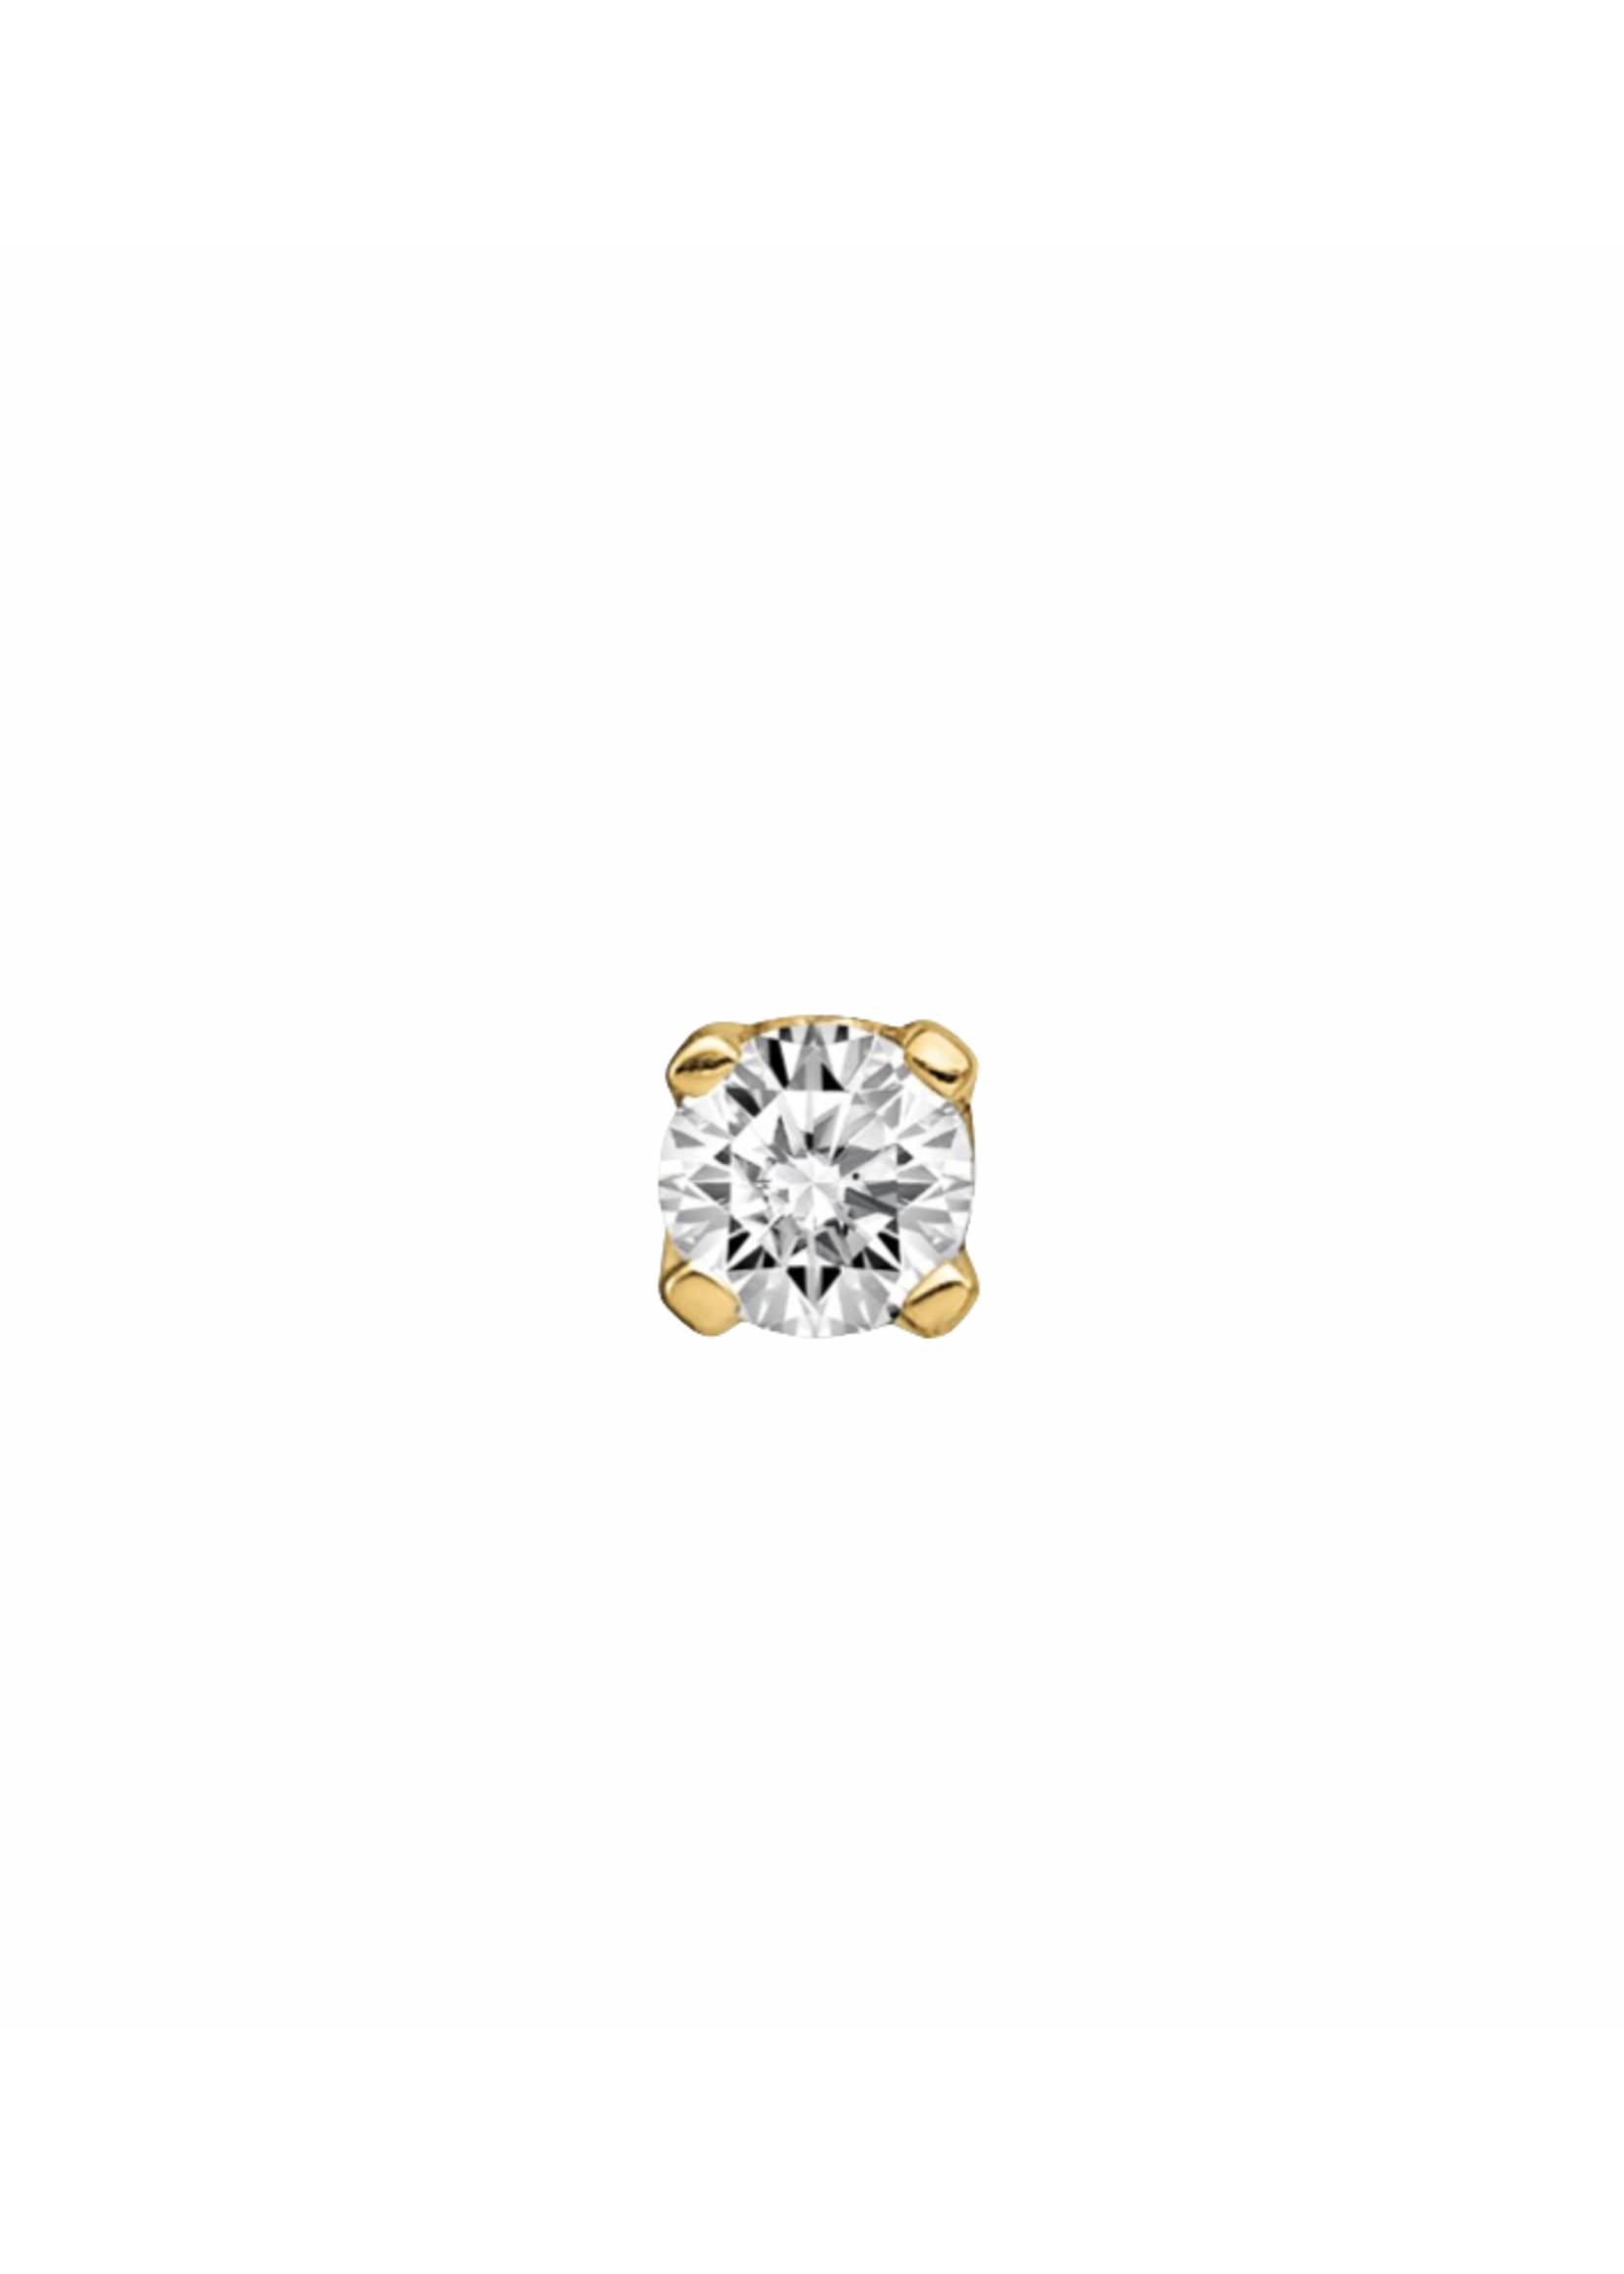 Jill Alberts Stud Diamond Earring